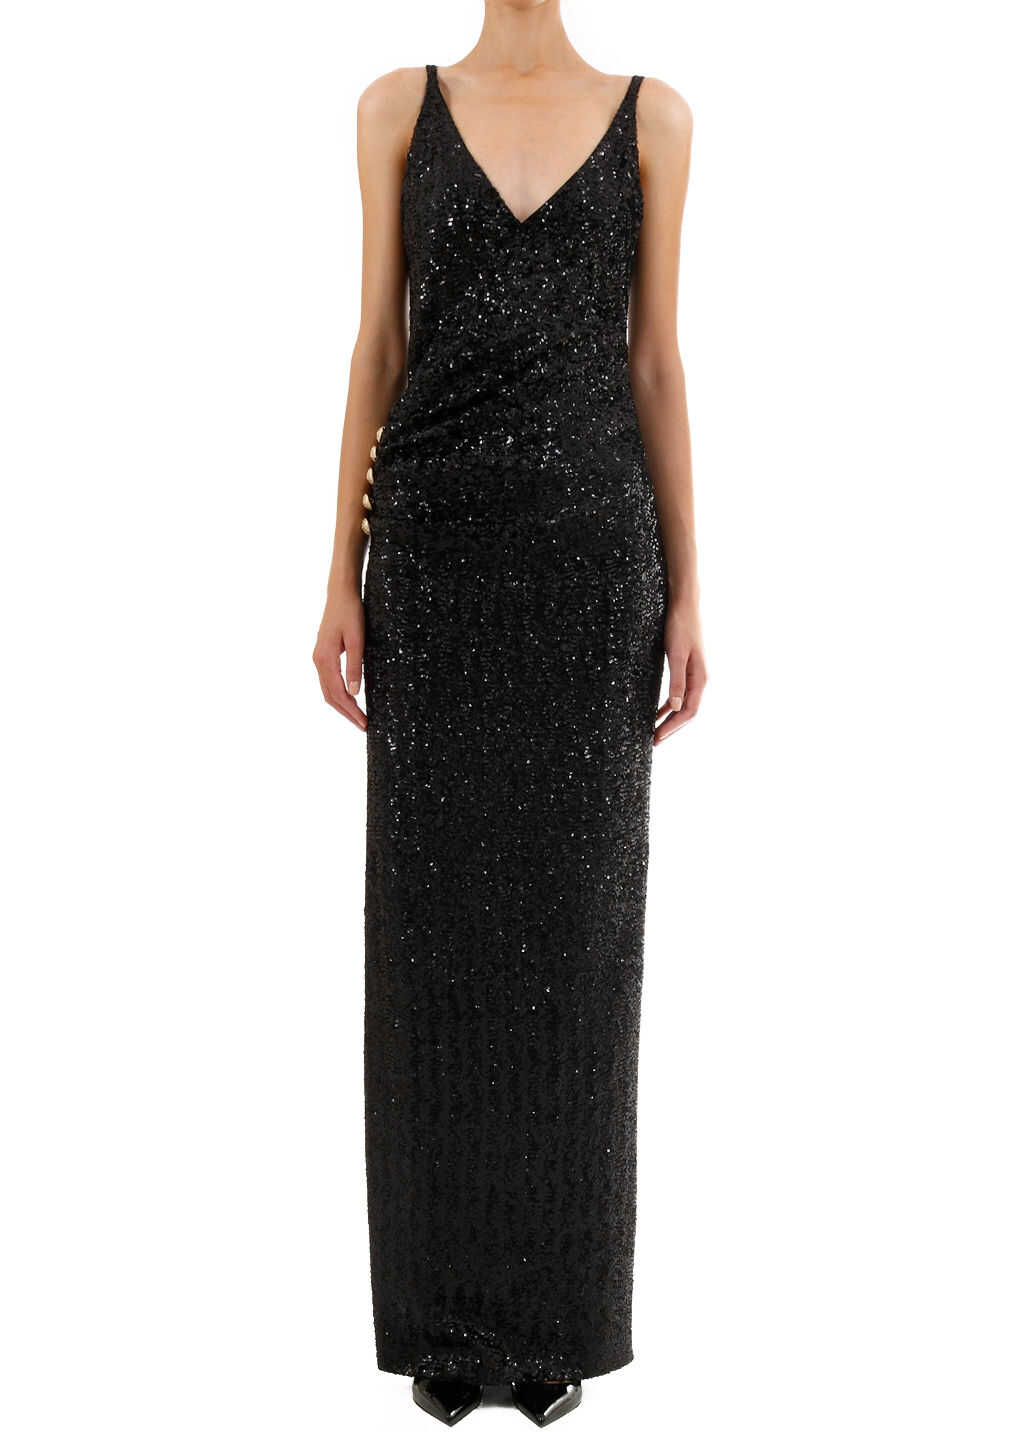 Balmain Sequins Long Dress SF16892 235X Black image0